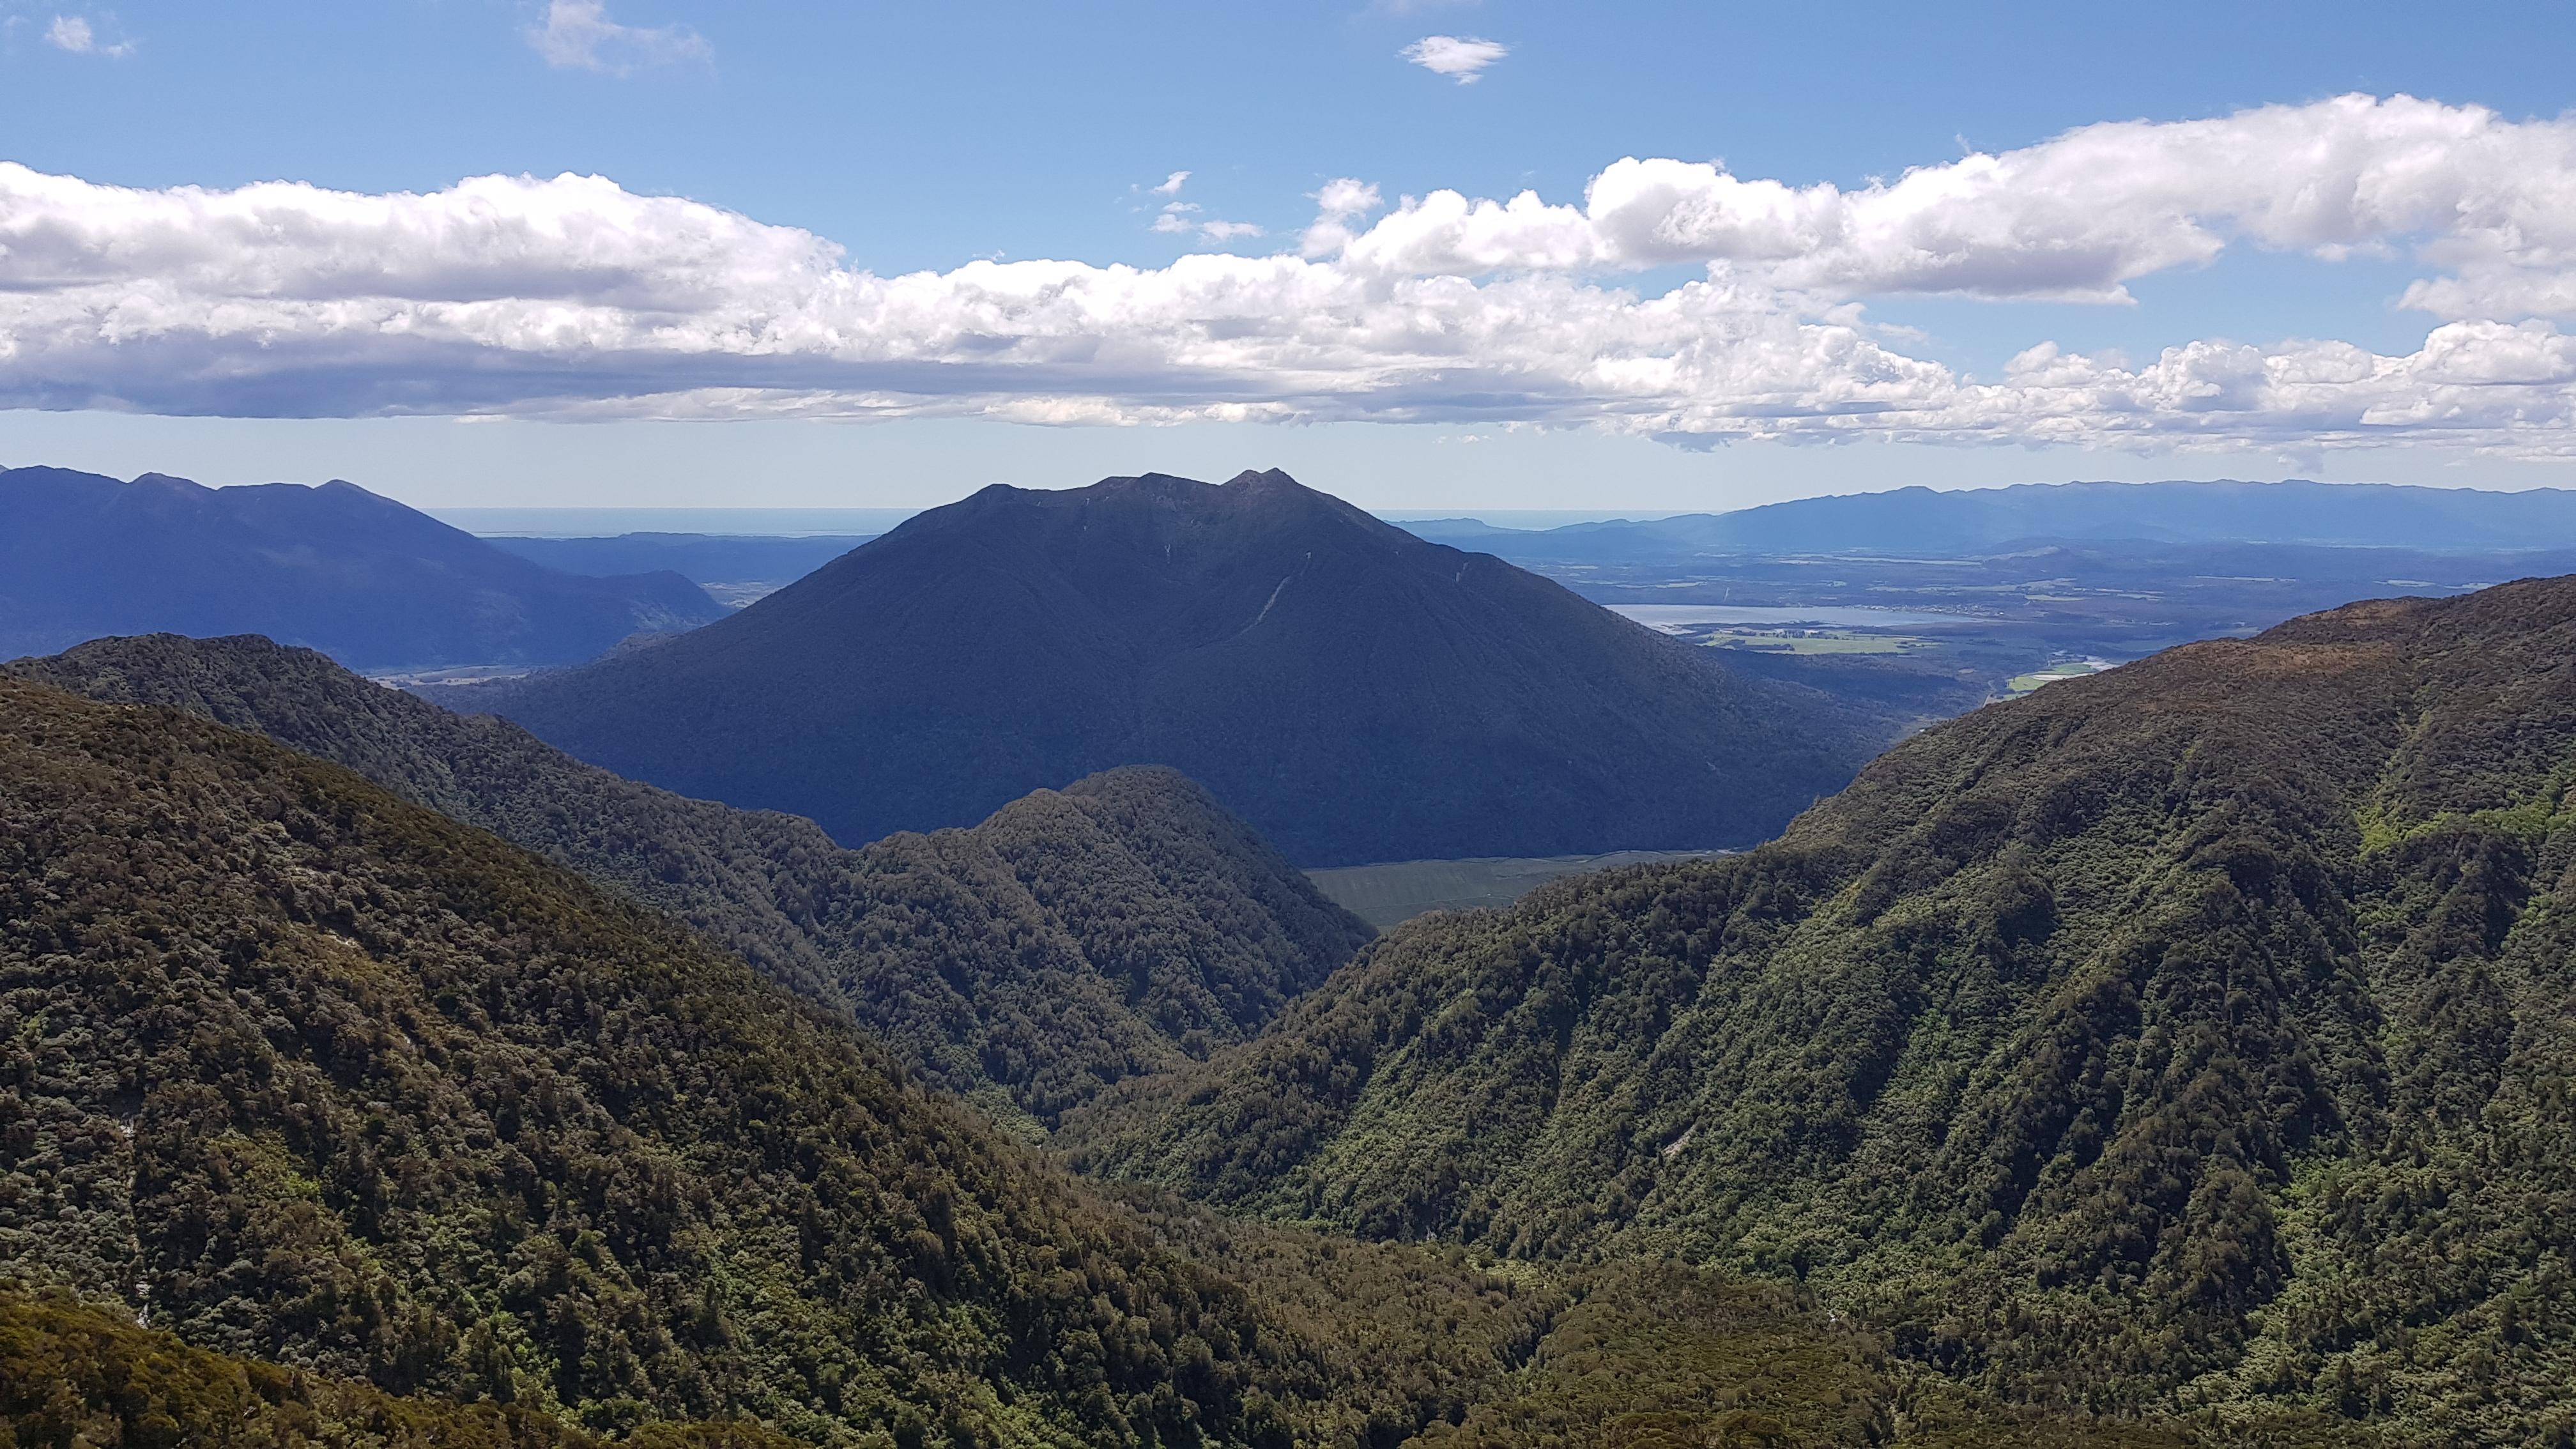 Looking back (West) to Te Kinga